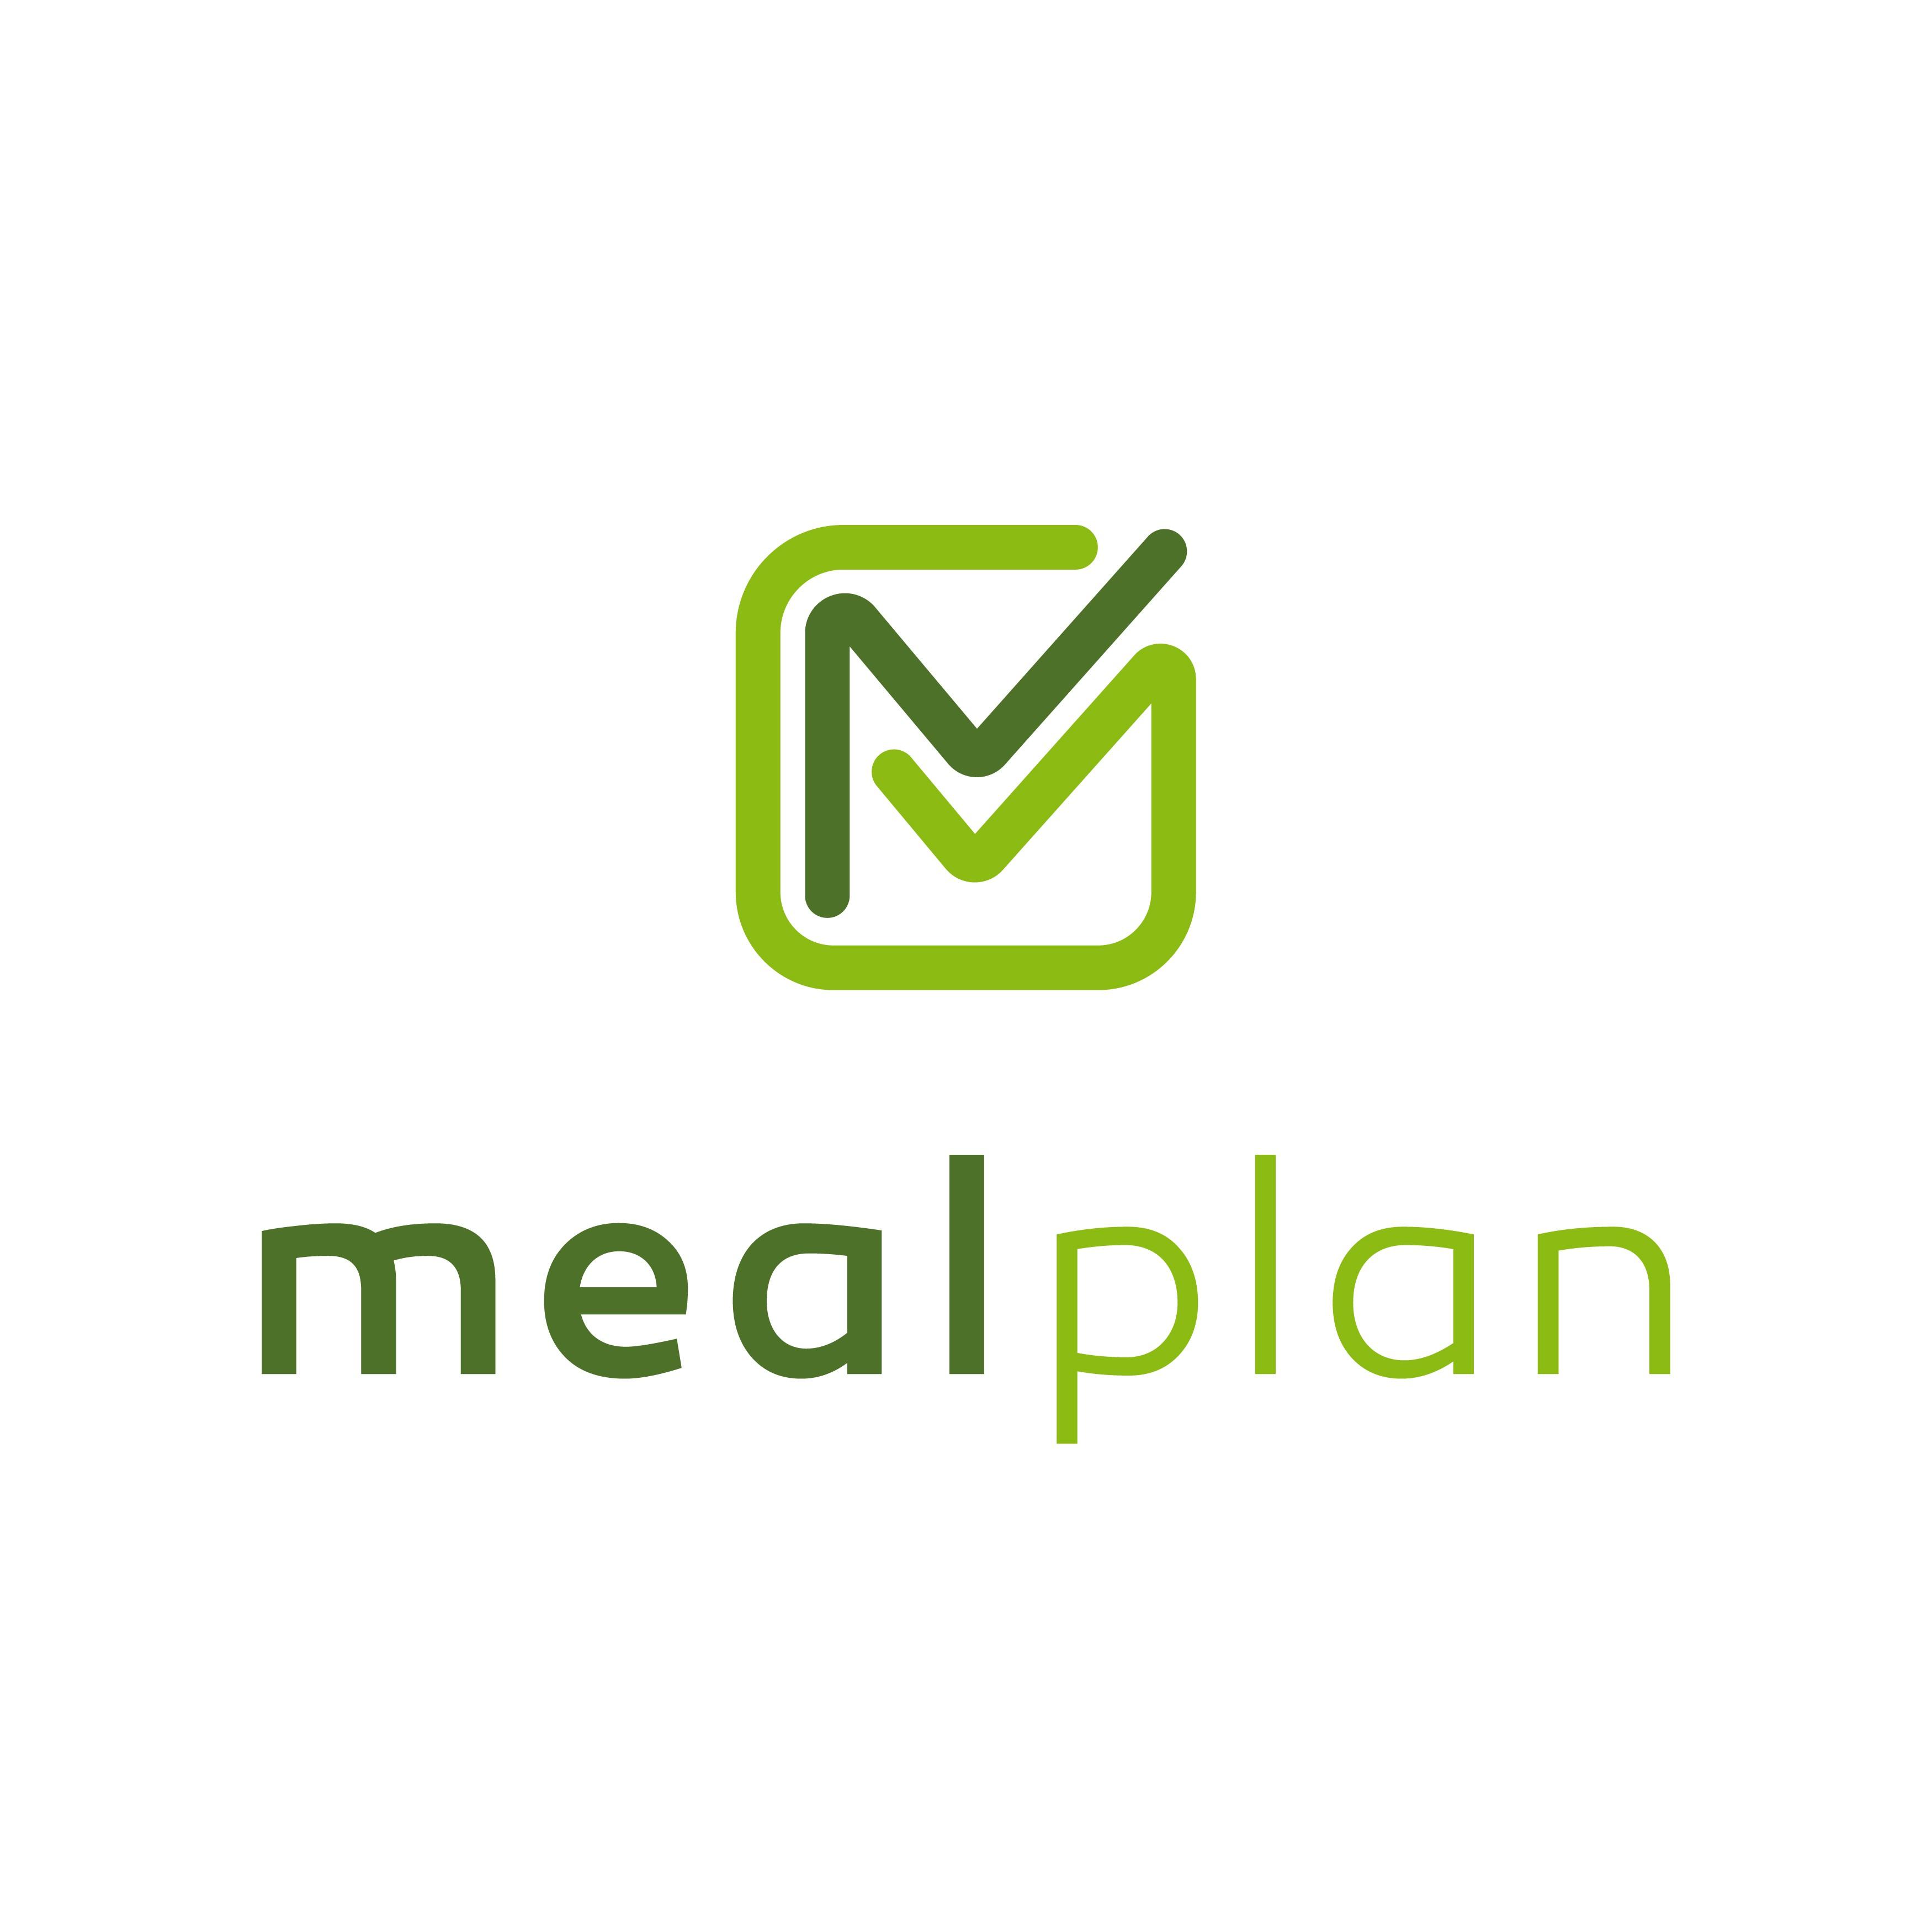 Mealplan logo design